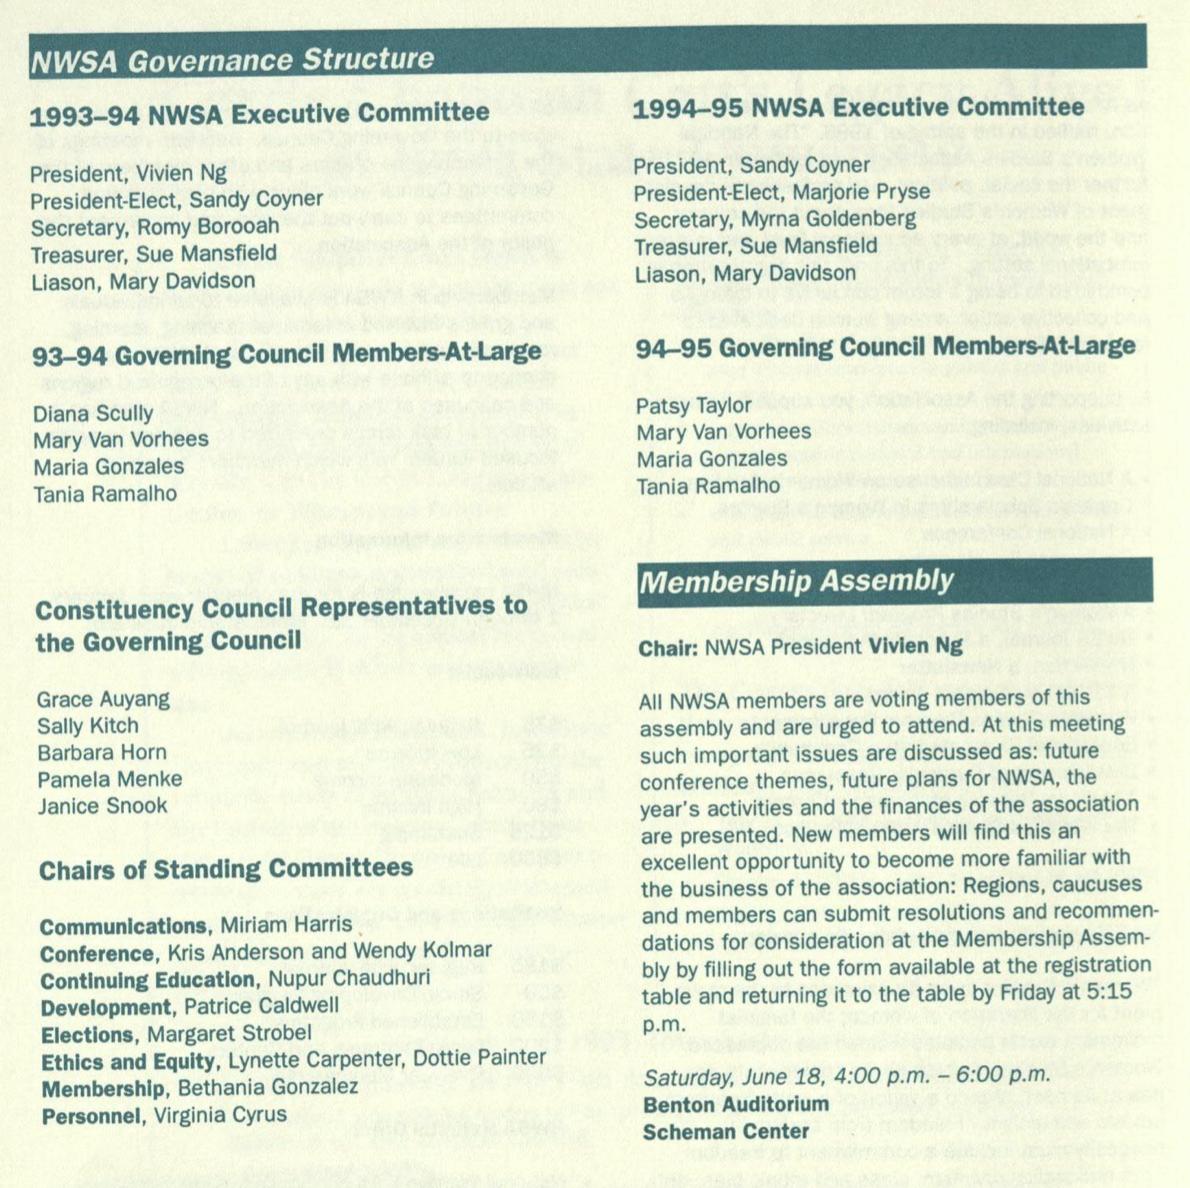 1994 Coordinating Council Members